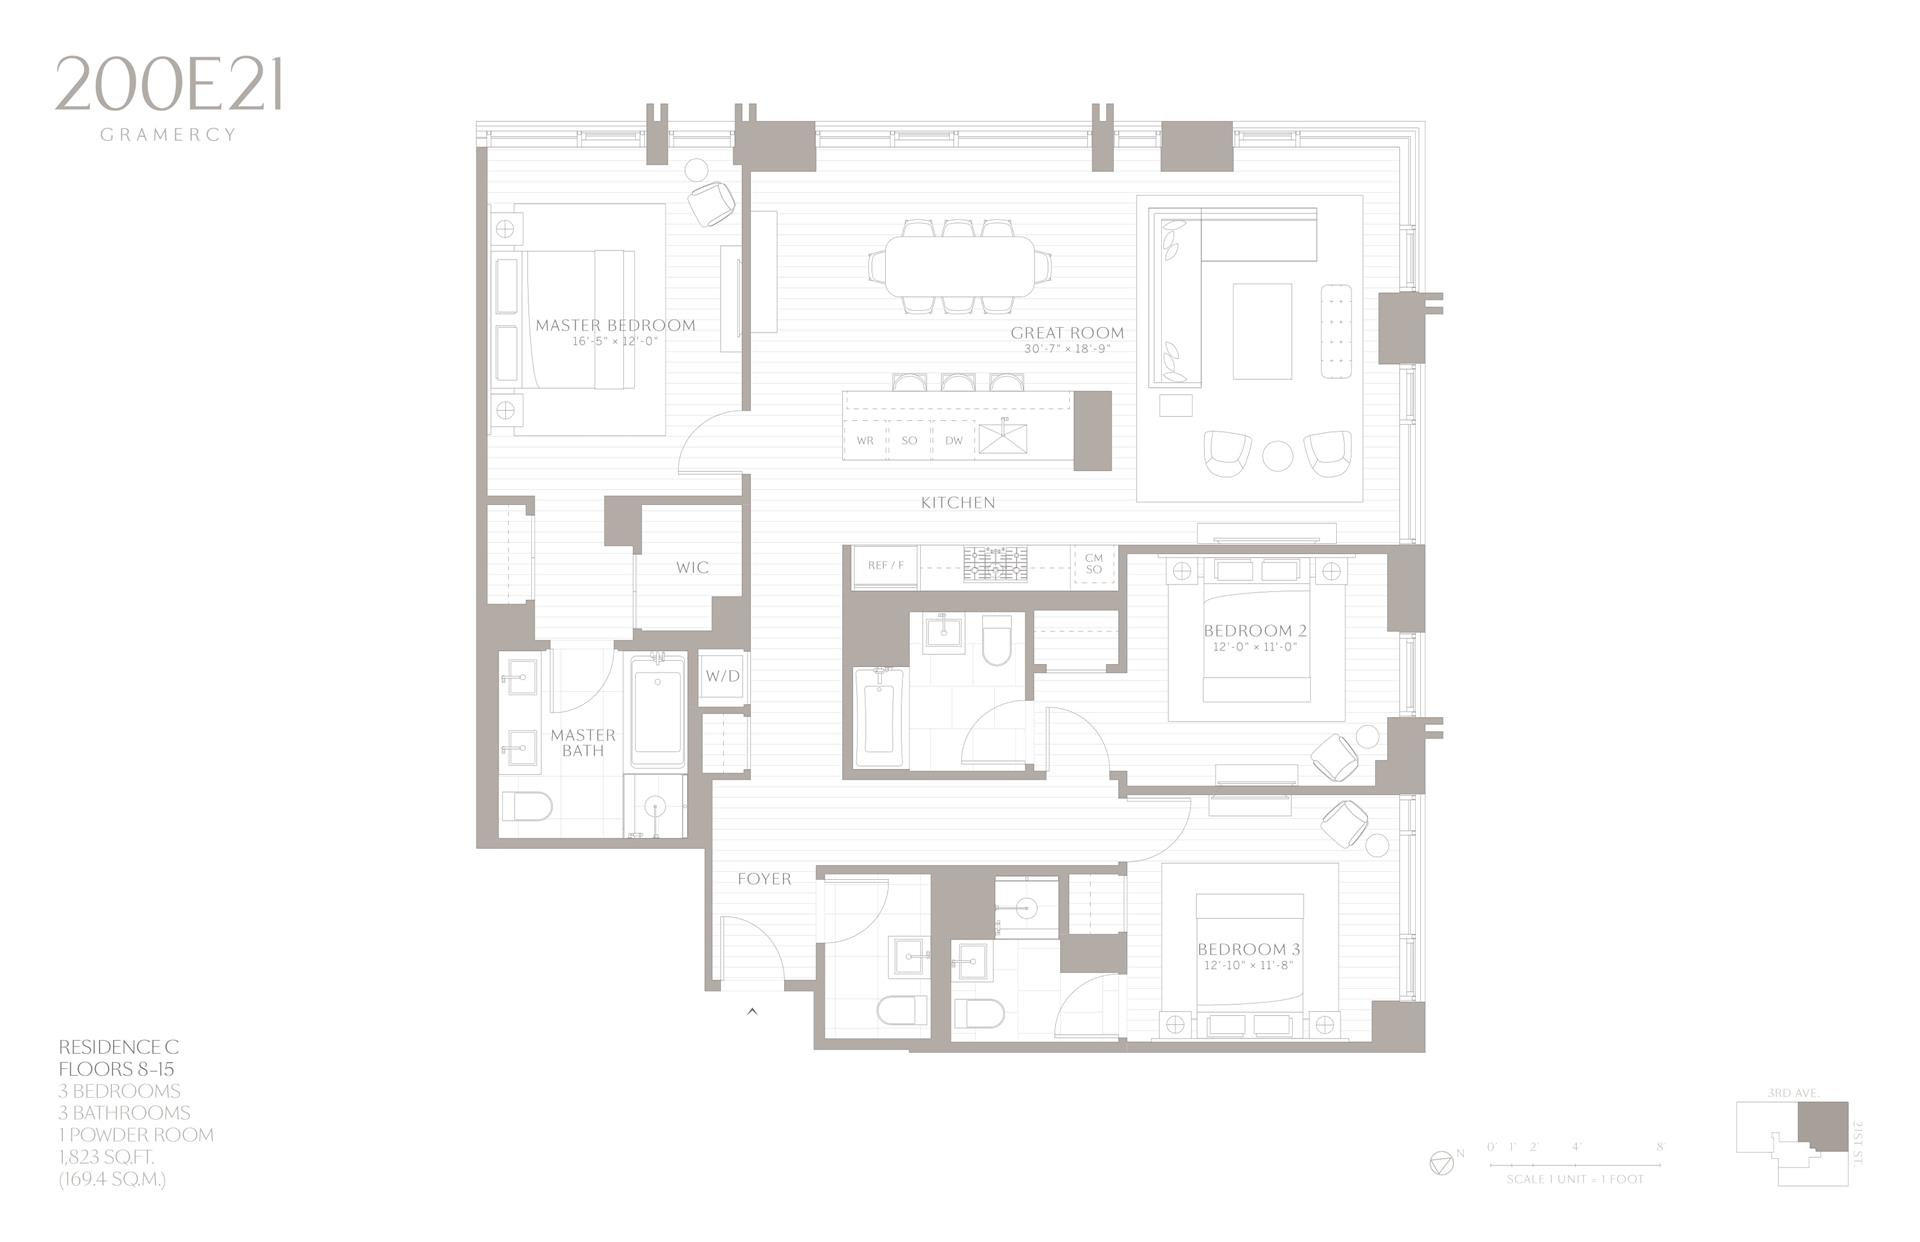 Floor plan of 200 East 21st St, 11C - Gramercy - Union Square, New York